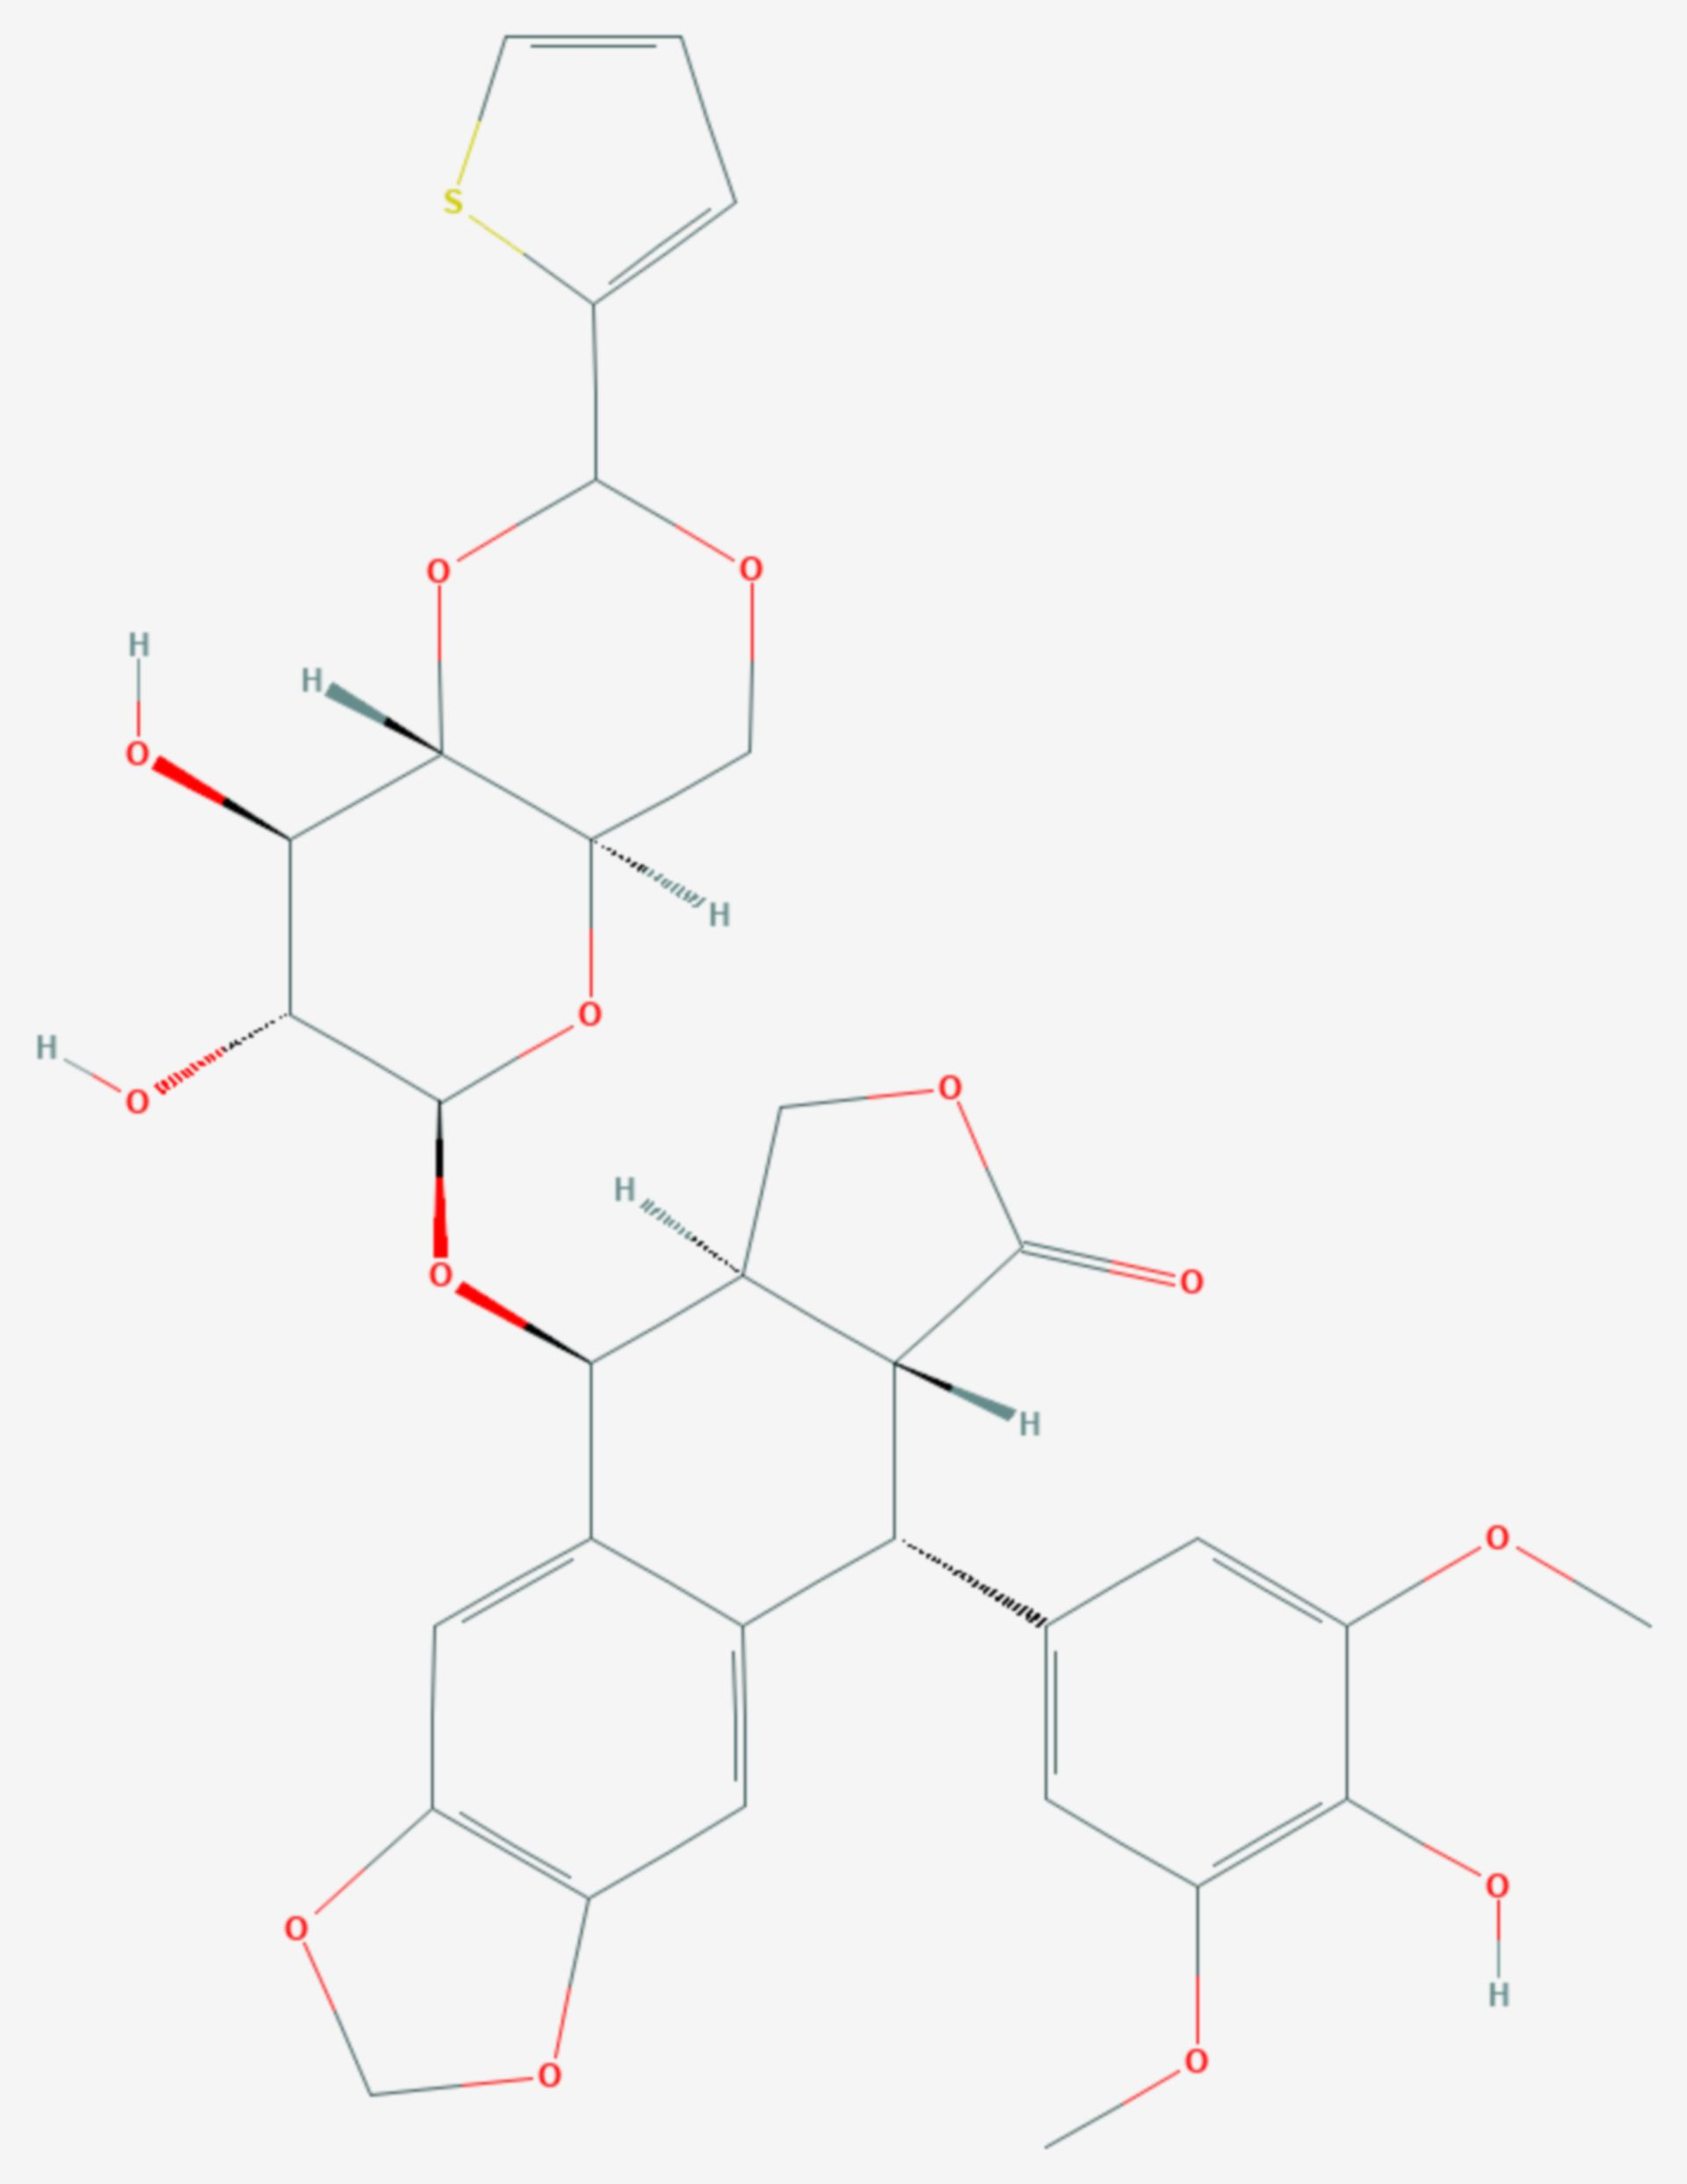 Teniposid (Strukturformel)